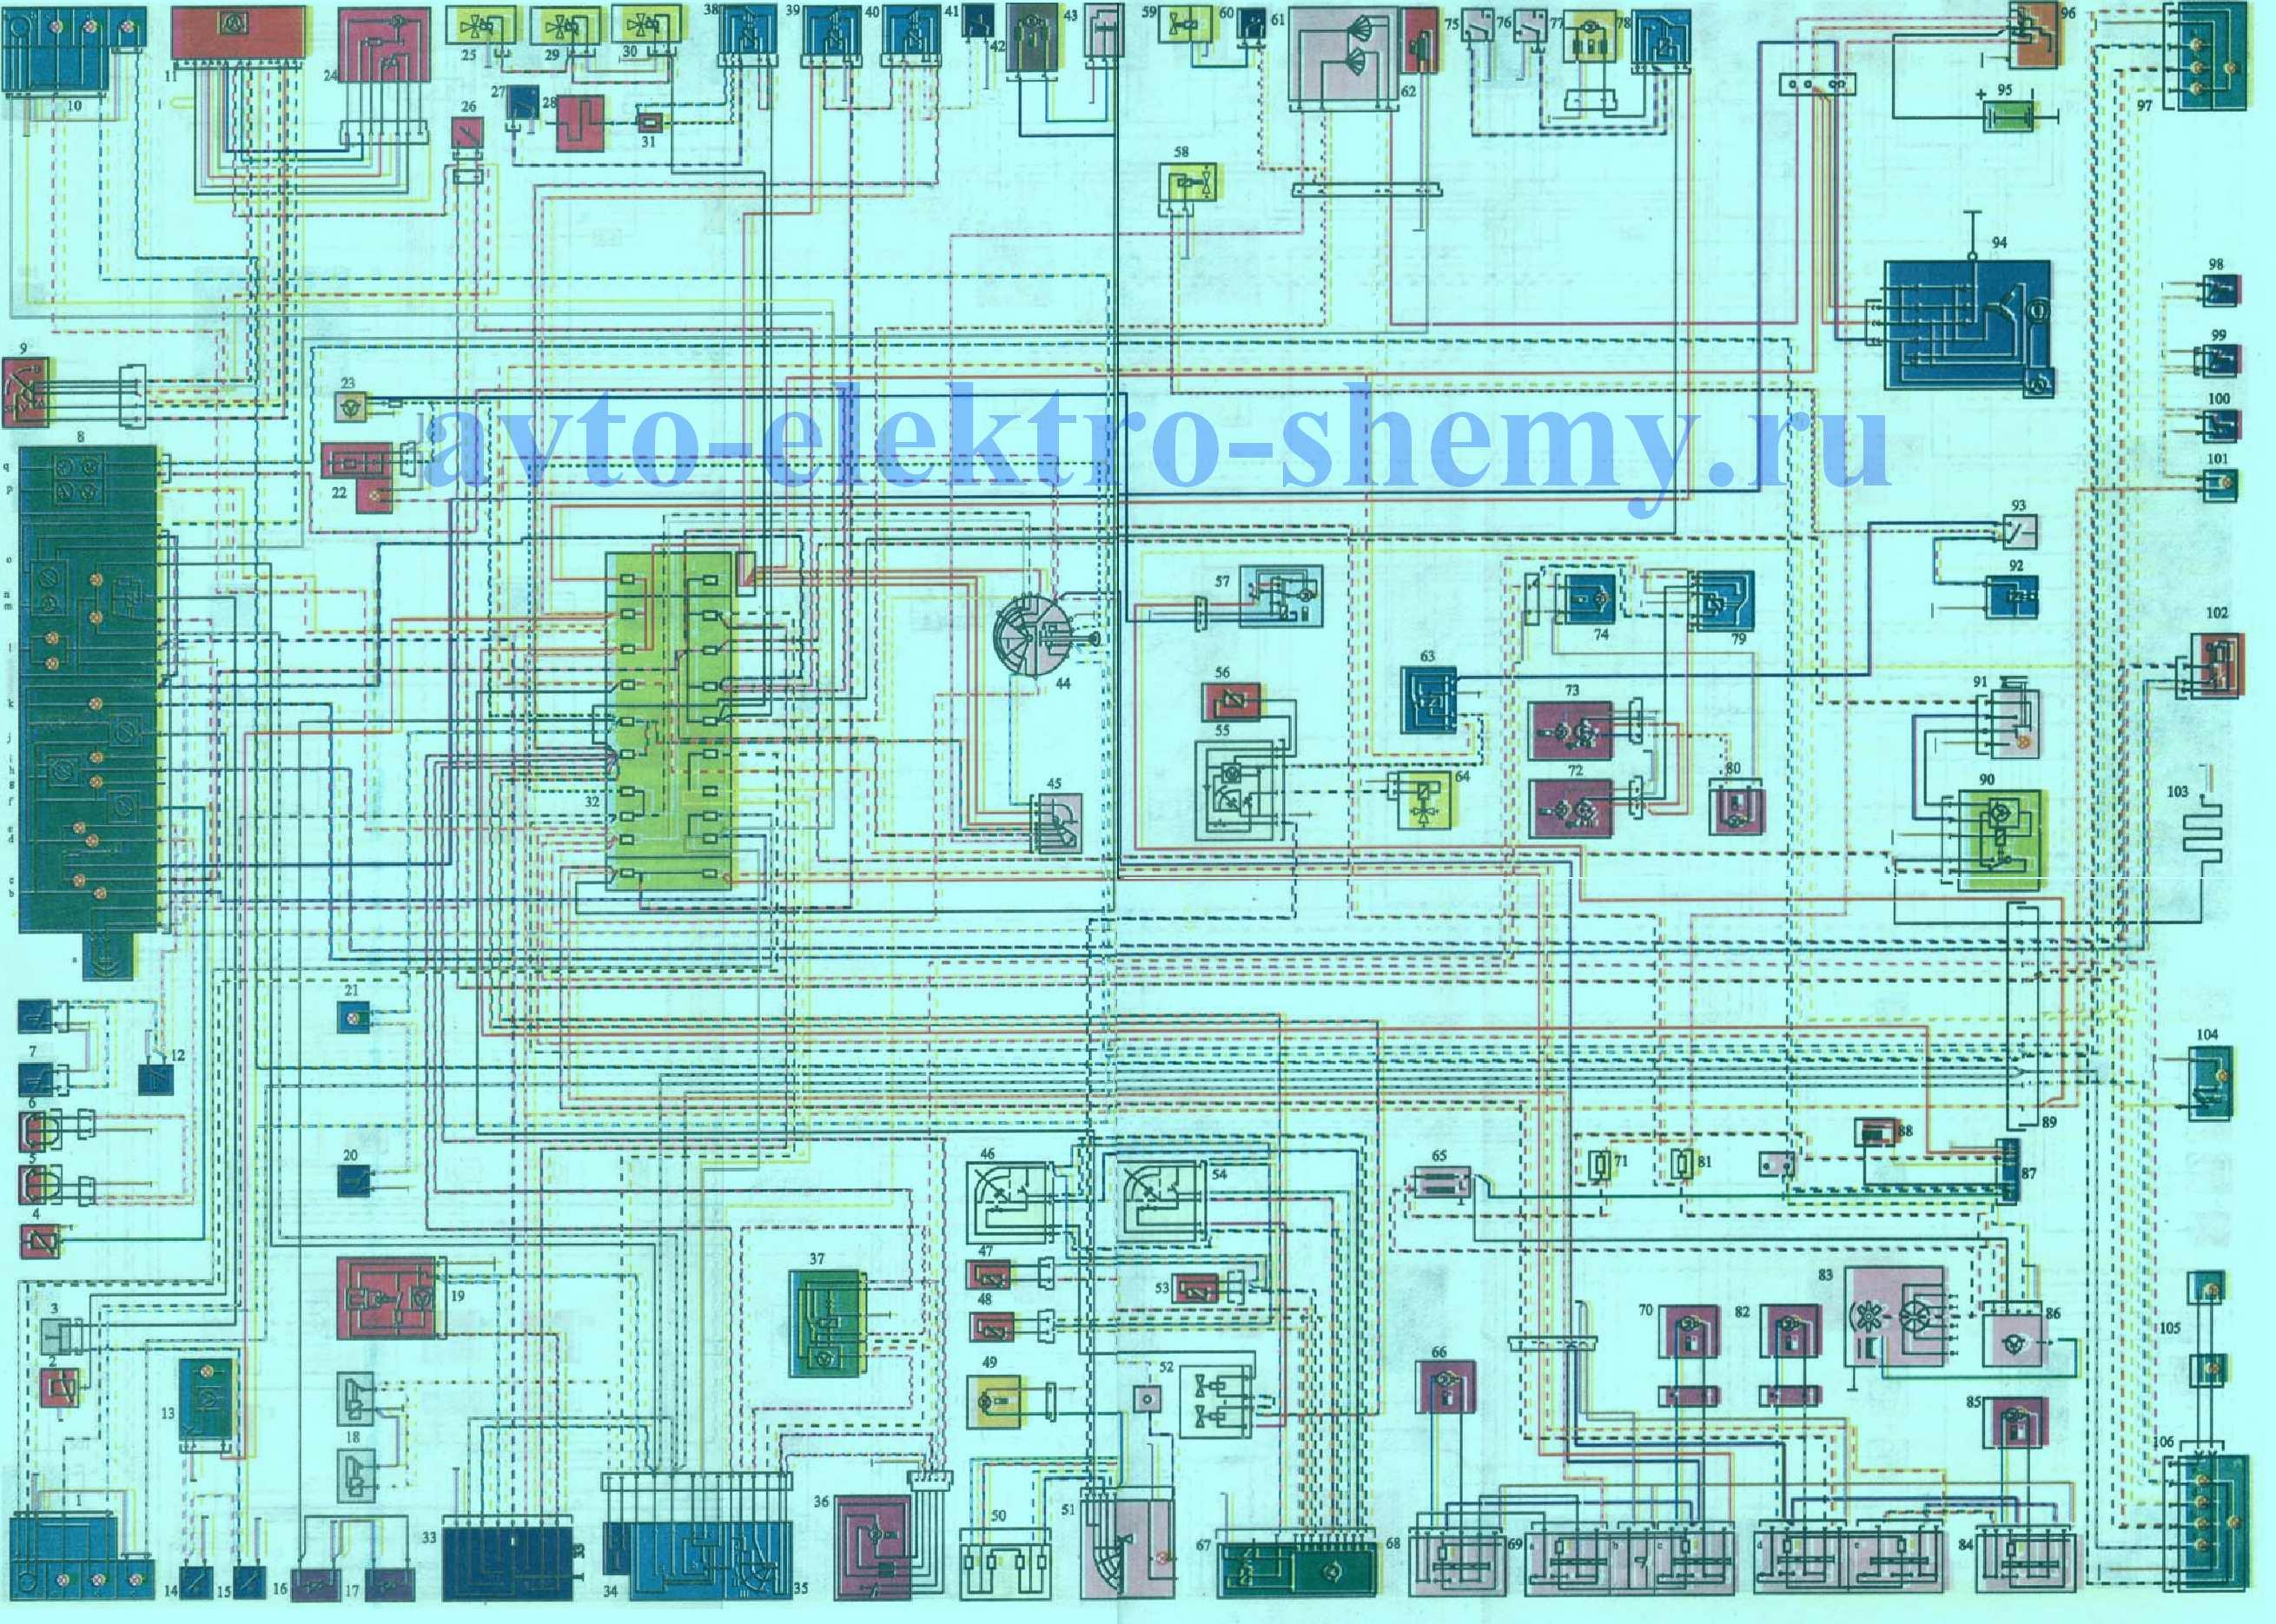 Схема электропроводки автомобиля Mersedes-Benz моделей 280S, 280SE, 350SE, 380SE, 450SE, 500SE (типа W 126).